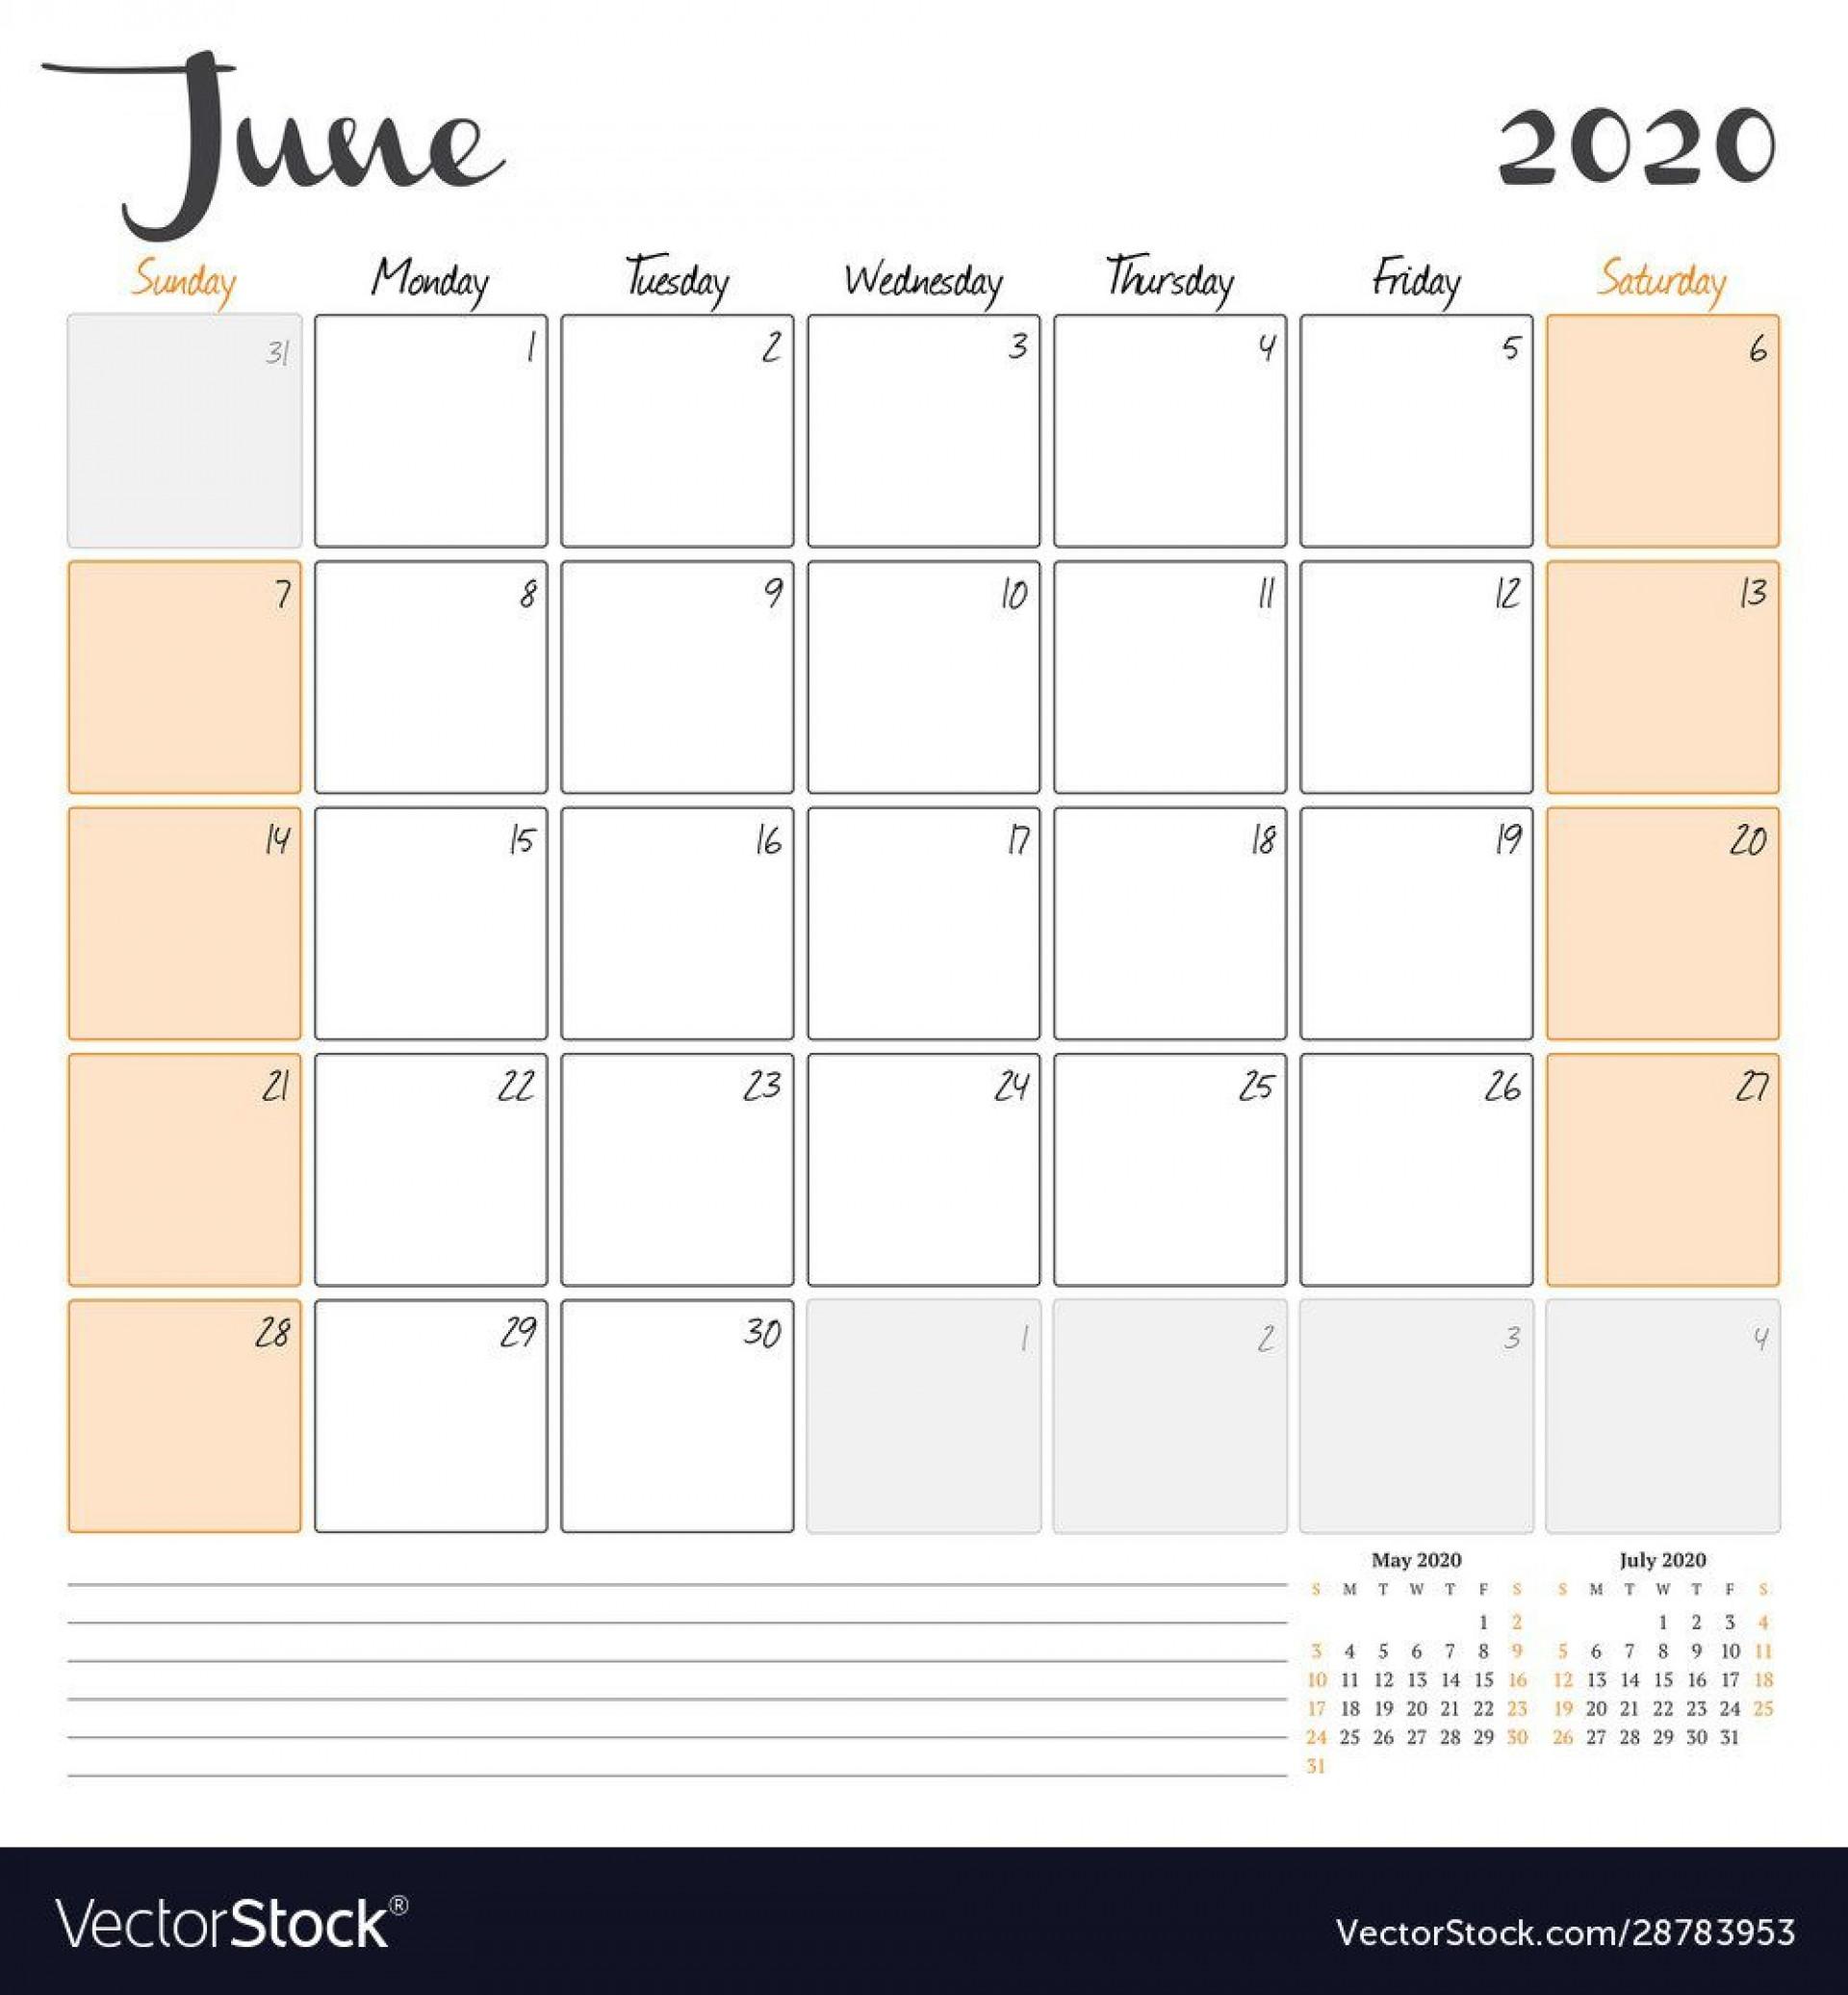 008 Beautiful June 2020 Monthly Calendar Template Inspiration 1920